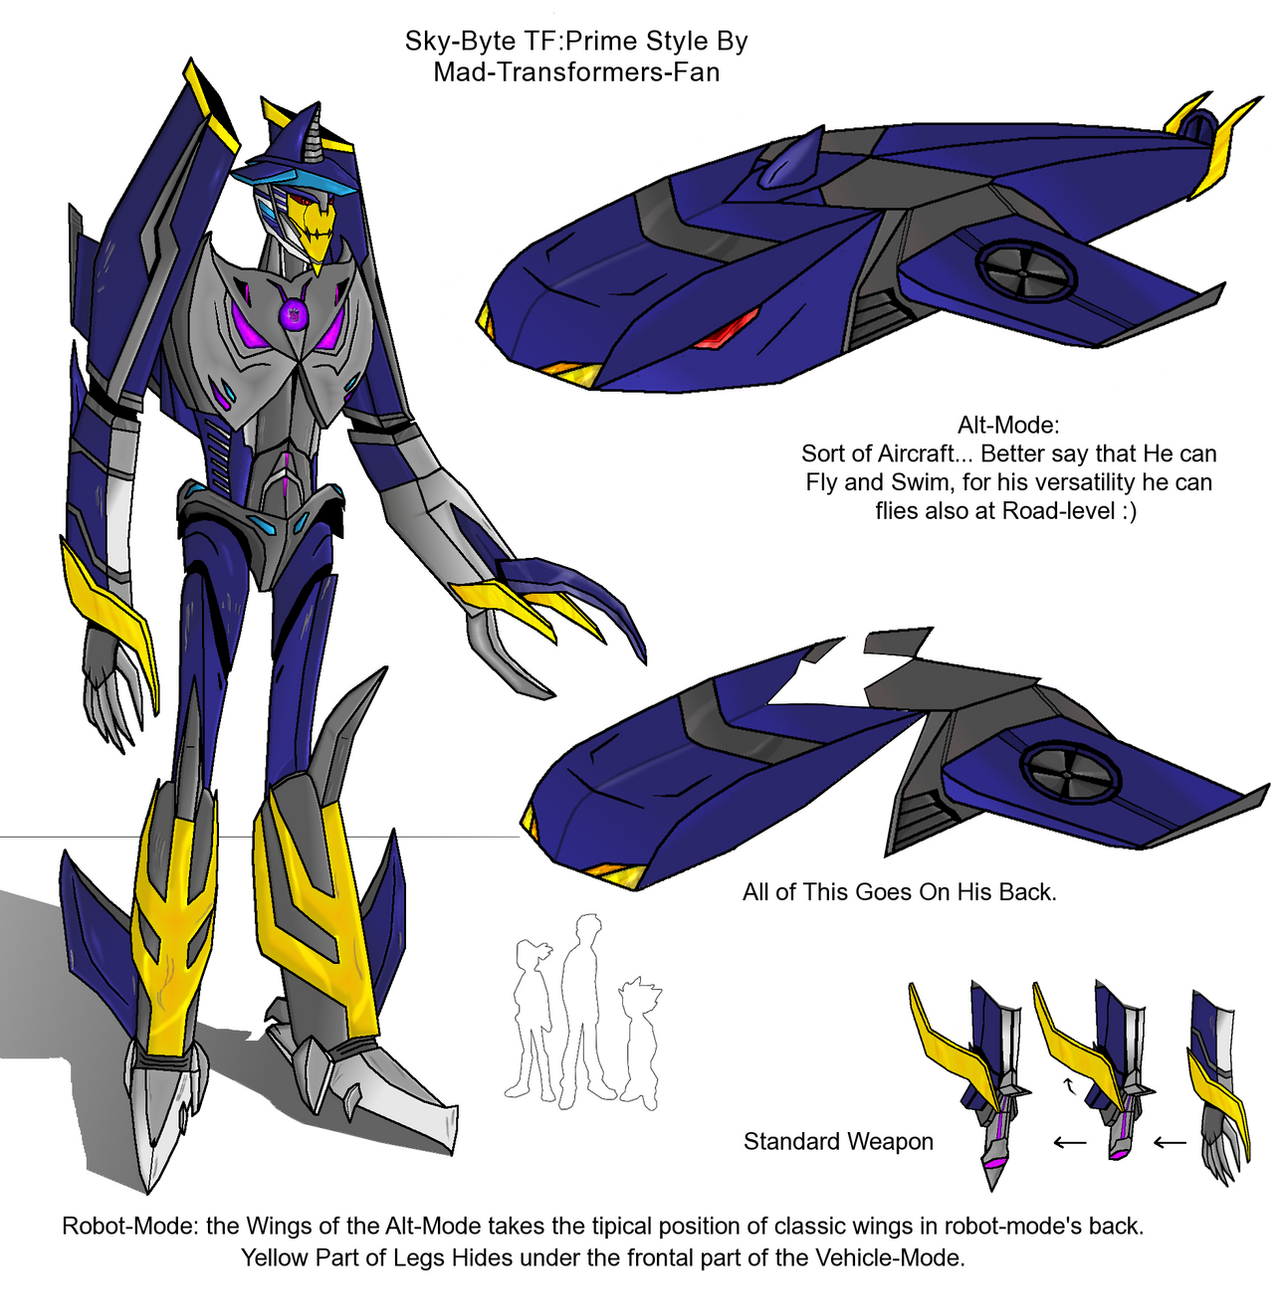 Sky-Byte TF:P Style sheet by Mad-Transformers-Fan